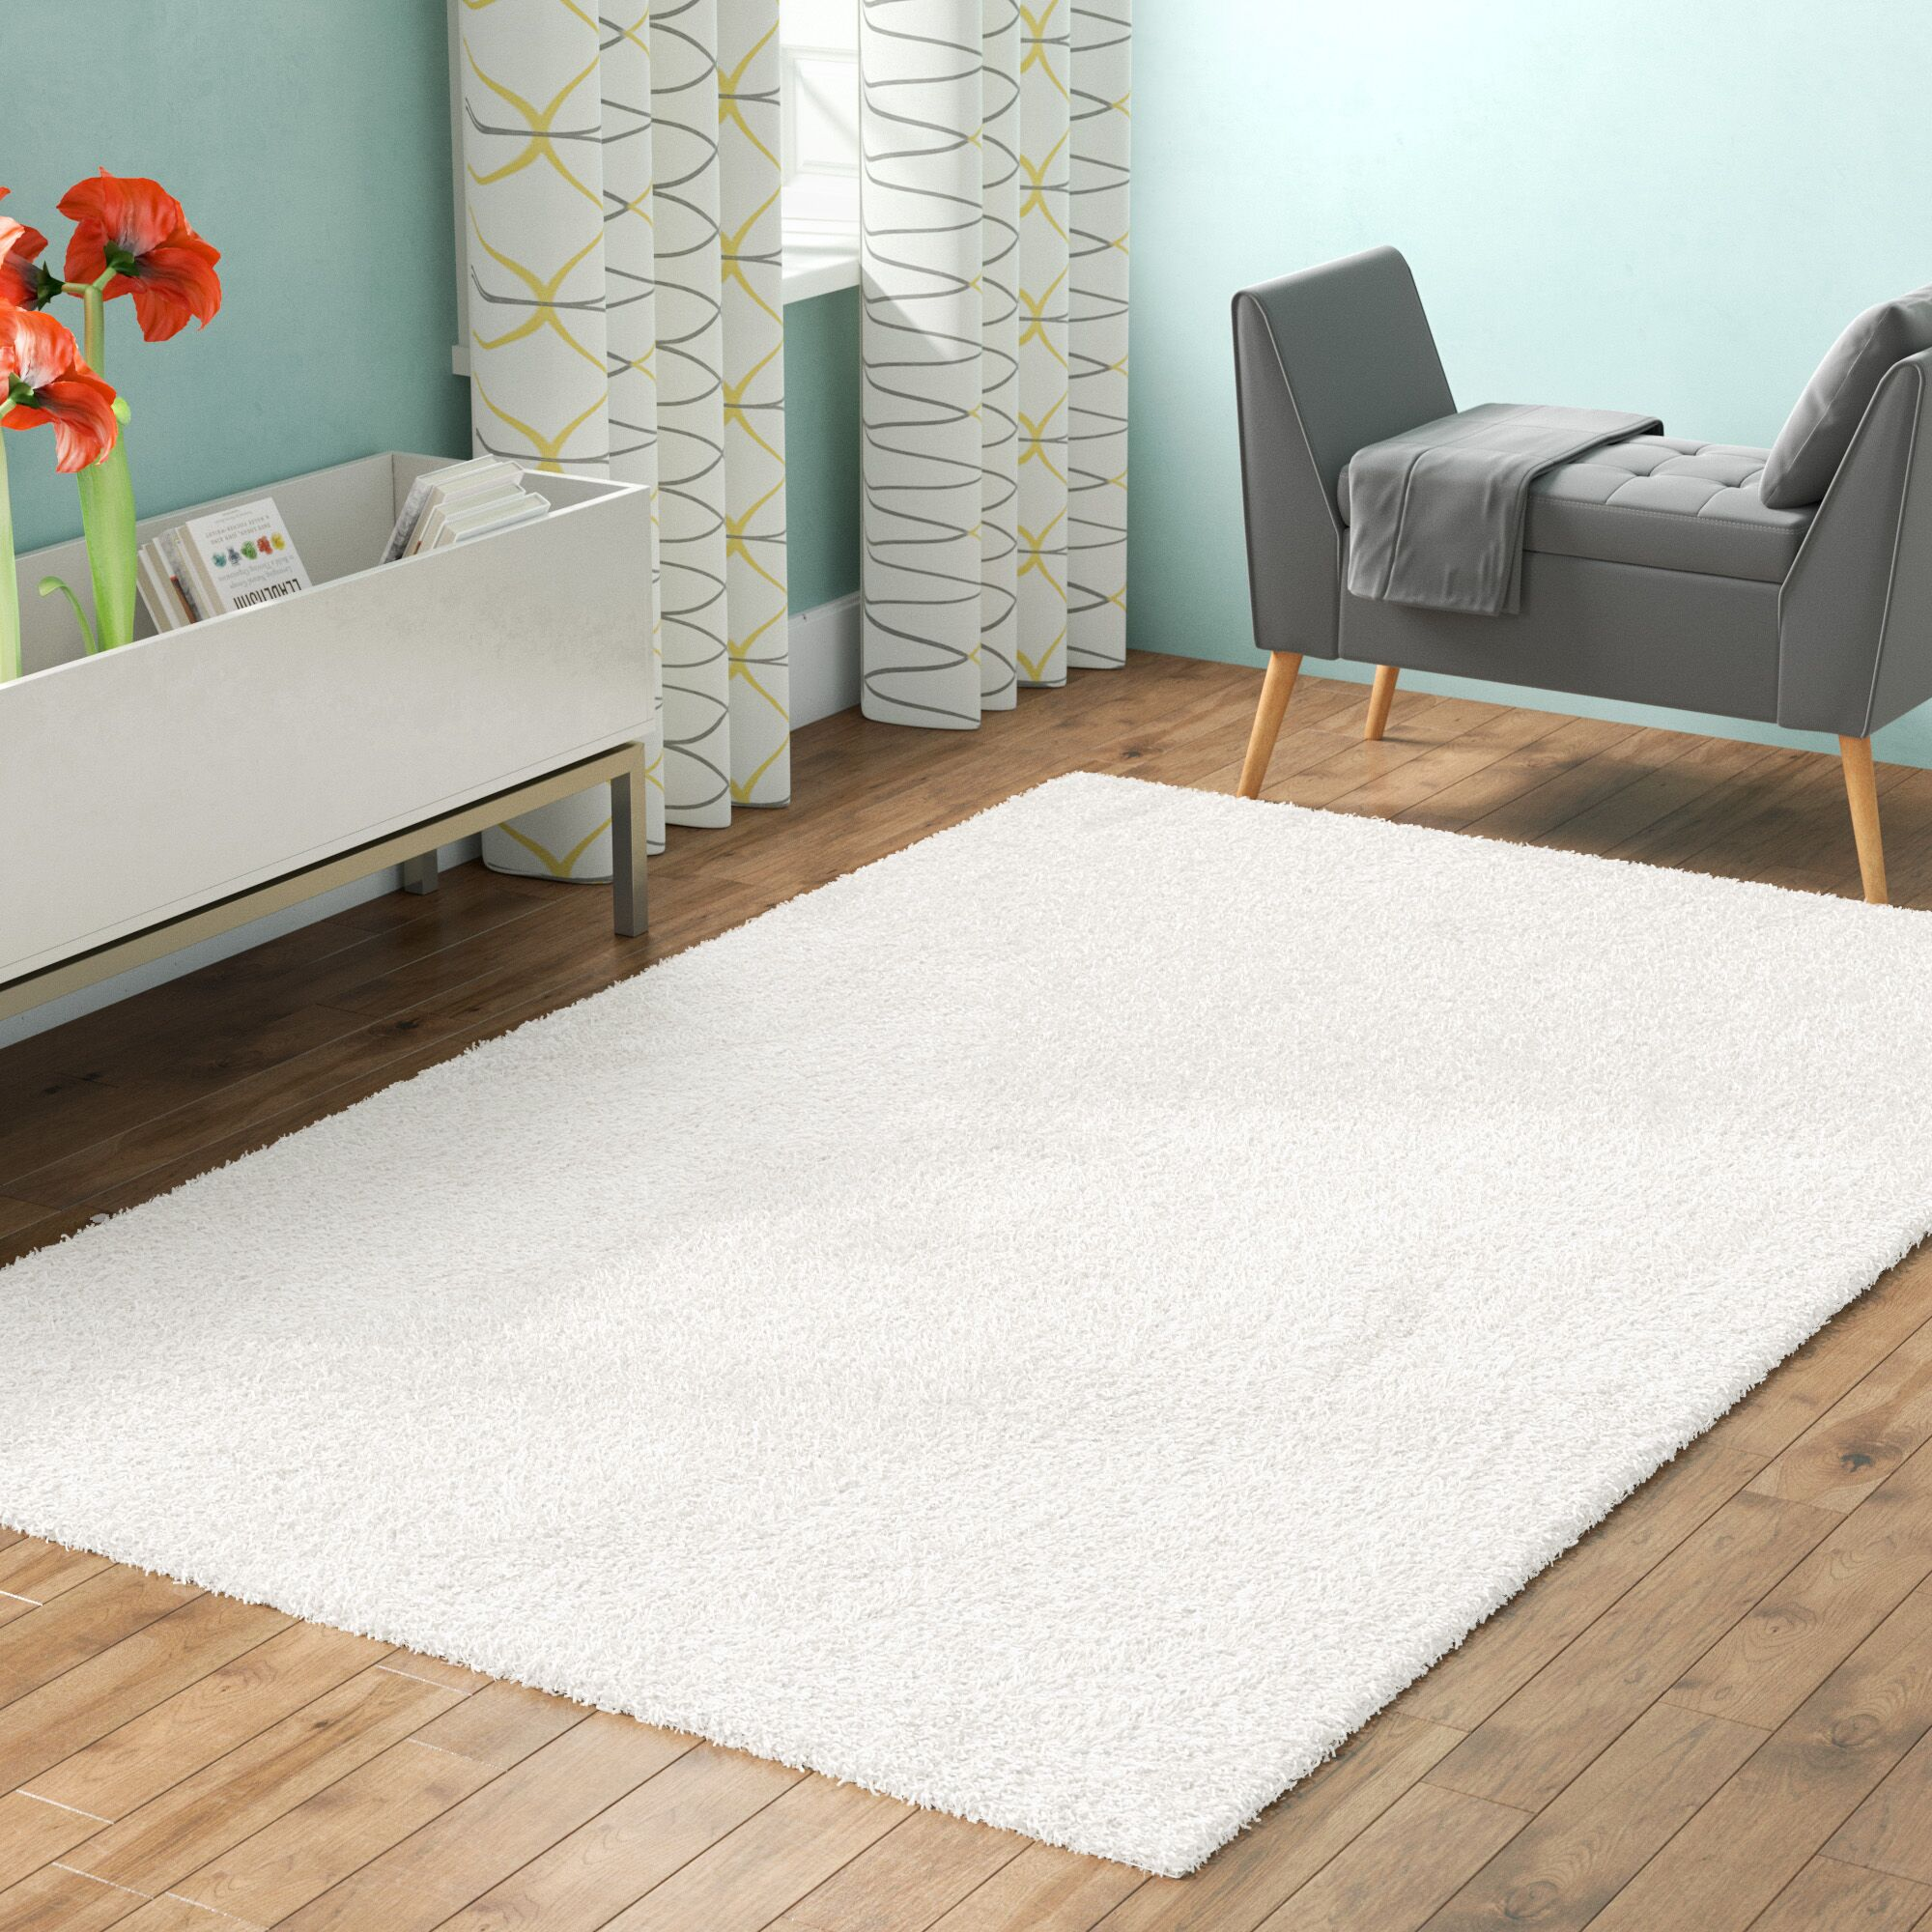 Kourtney White Area Rug Rug Size: Rectangle 6' x 9'